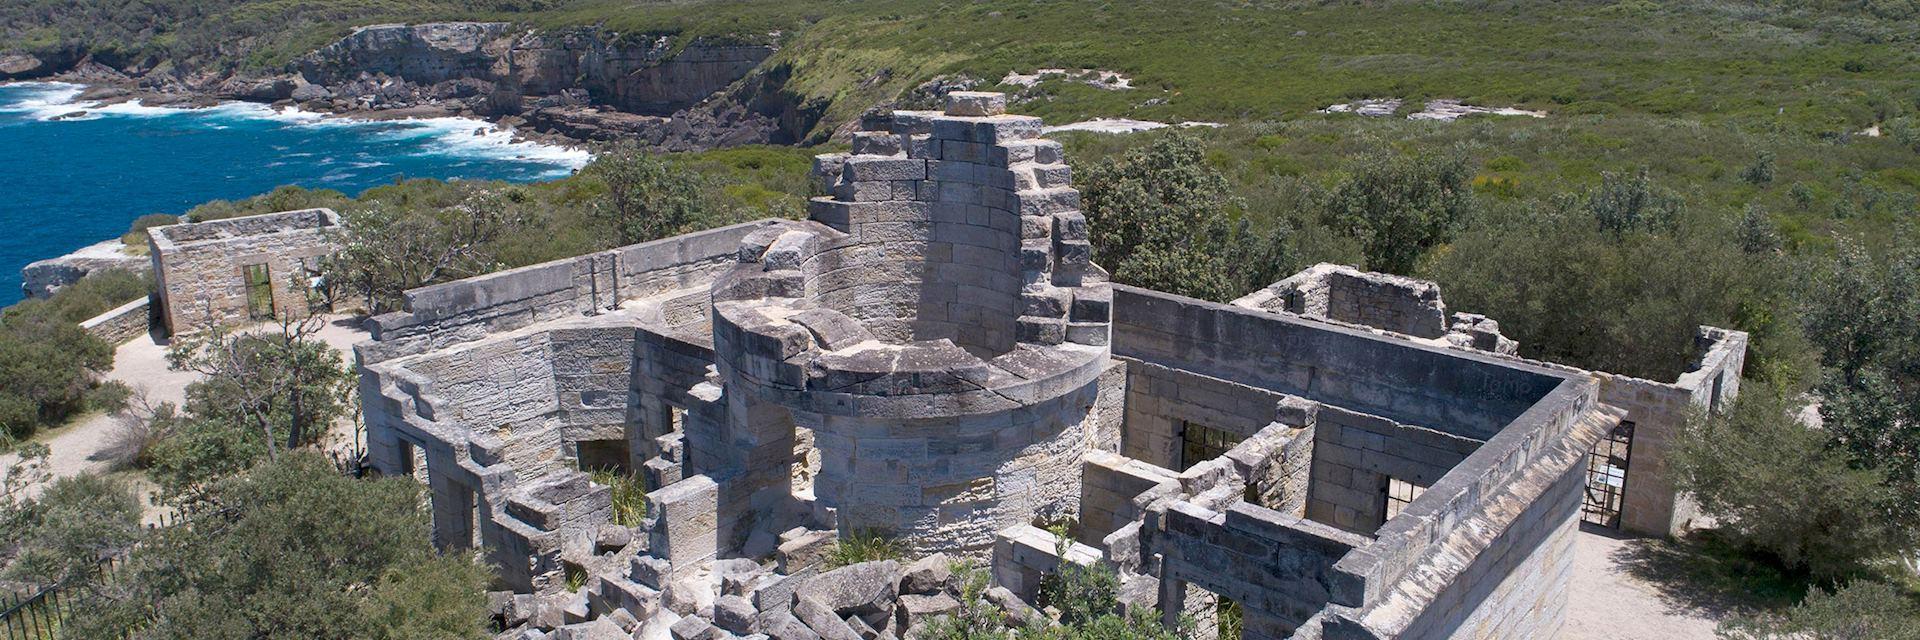 Cape St George Lighthouse, Jervis Bay